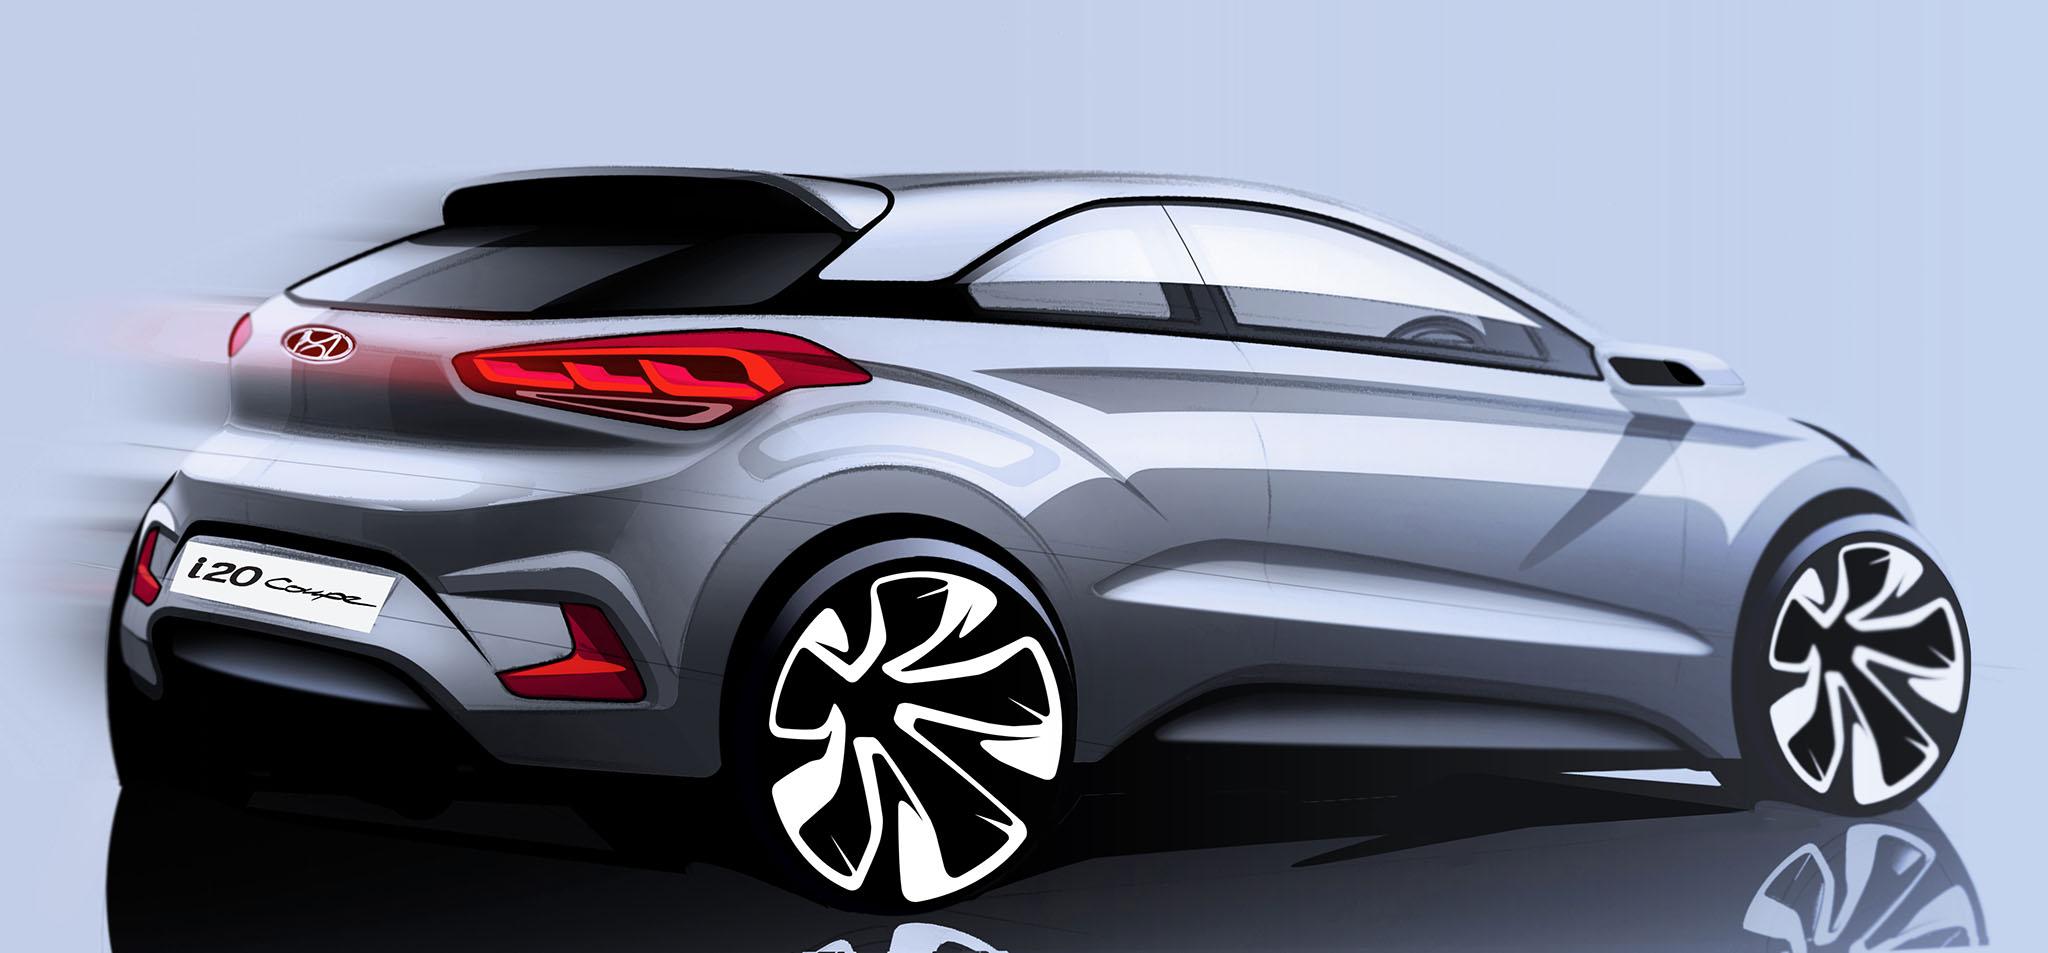 Hyundaii20Coupe 01